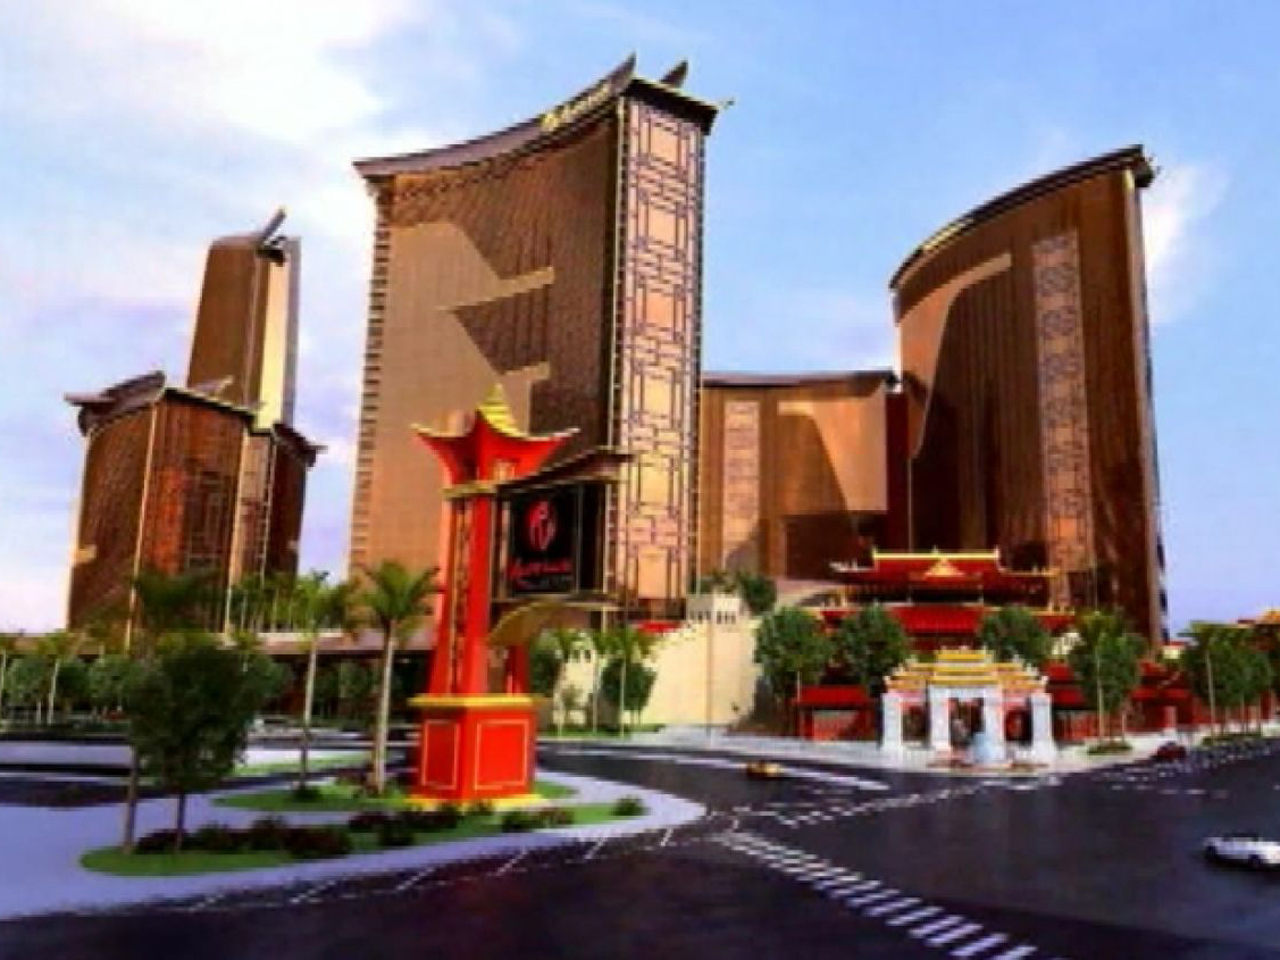 Las vegas new casino regulate gambling